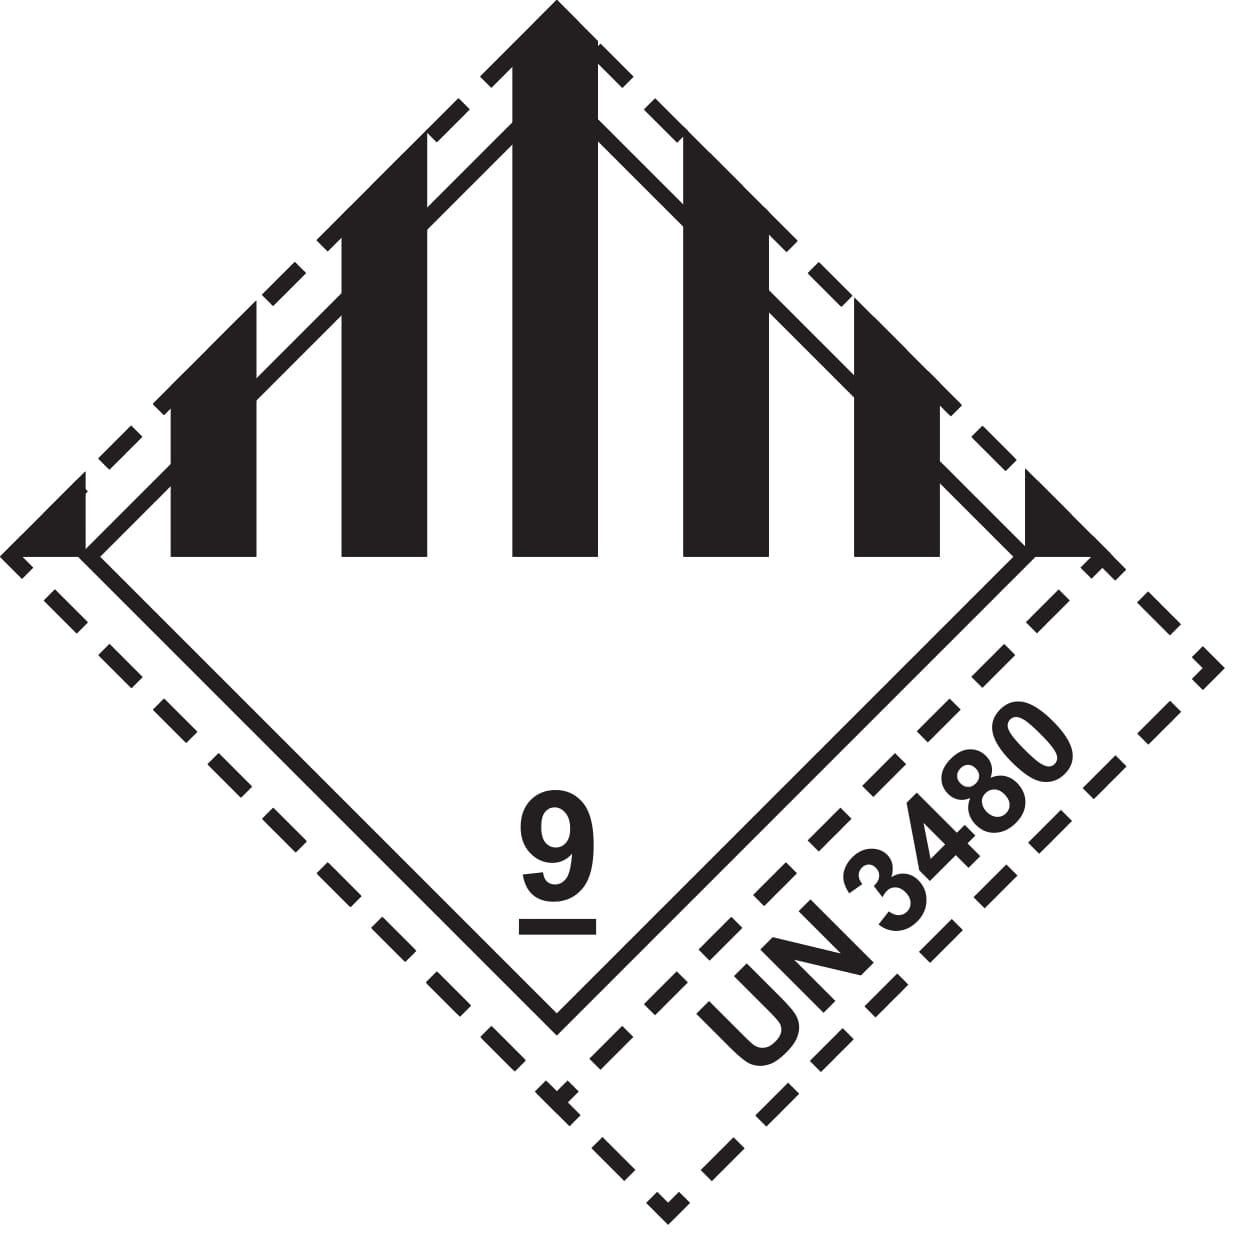 gefahrgut-label-kl9-3480-1